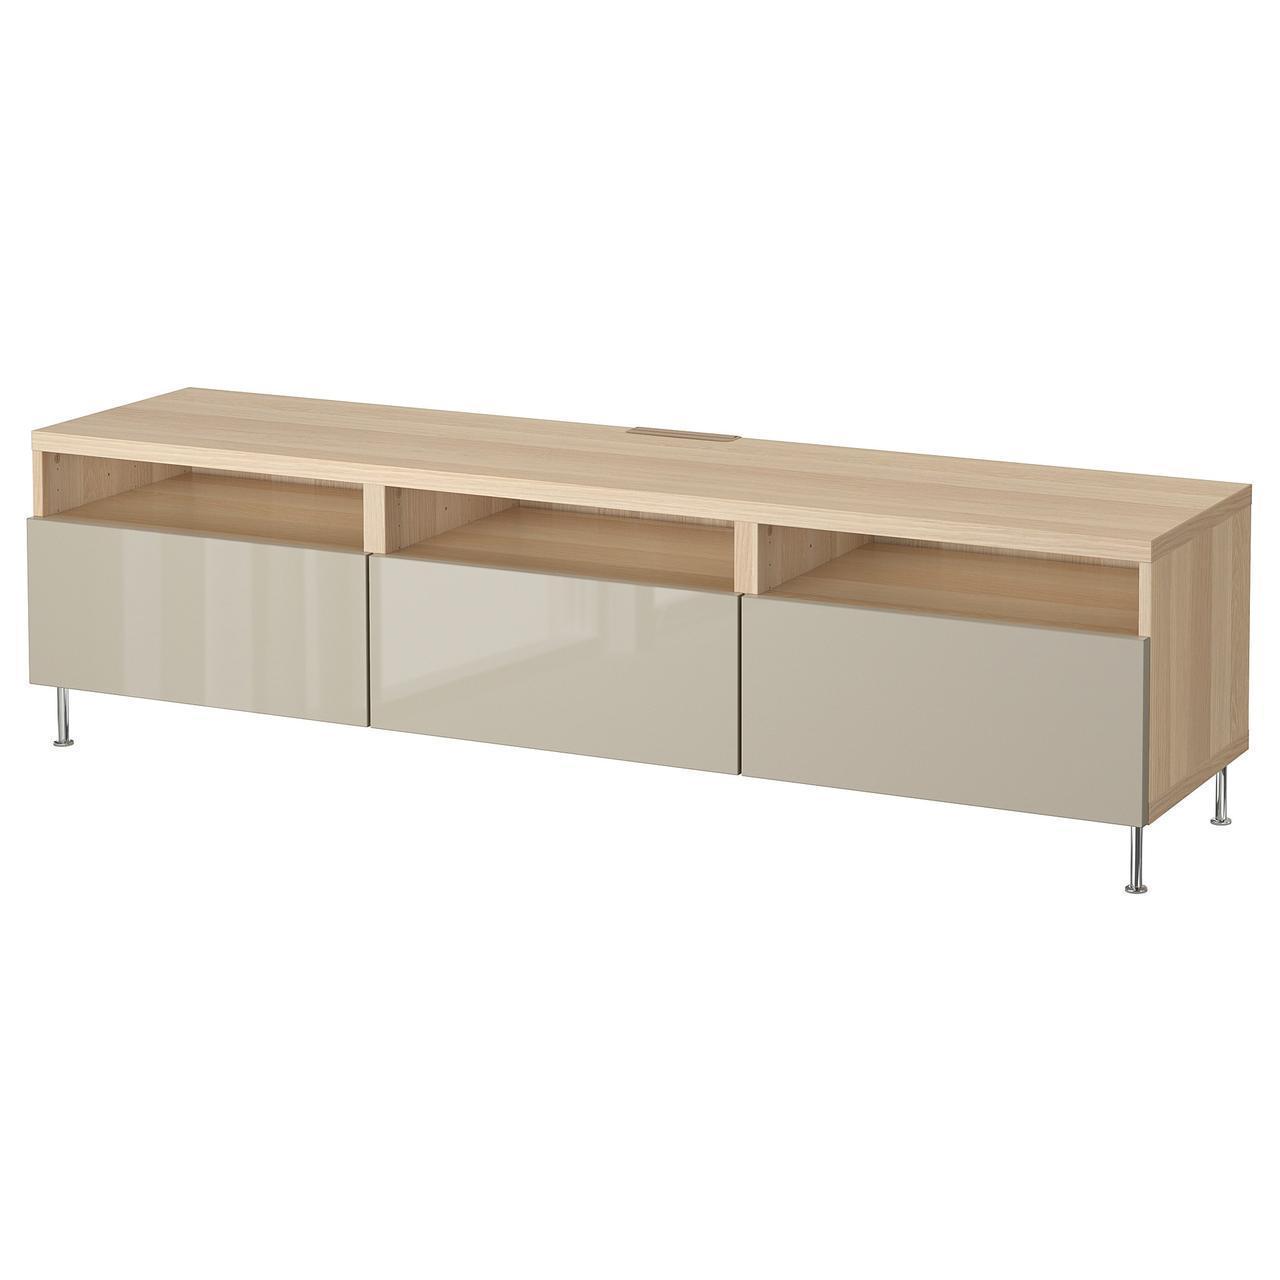 IKEA BESTA Тумба под телевизор с ящиками, белый дуб, Сельсвикен/Сталларп бежевый  (092.682.35)